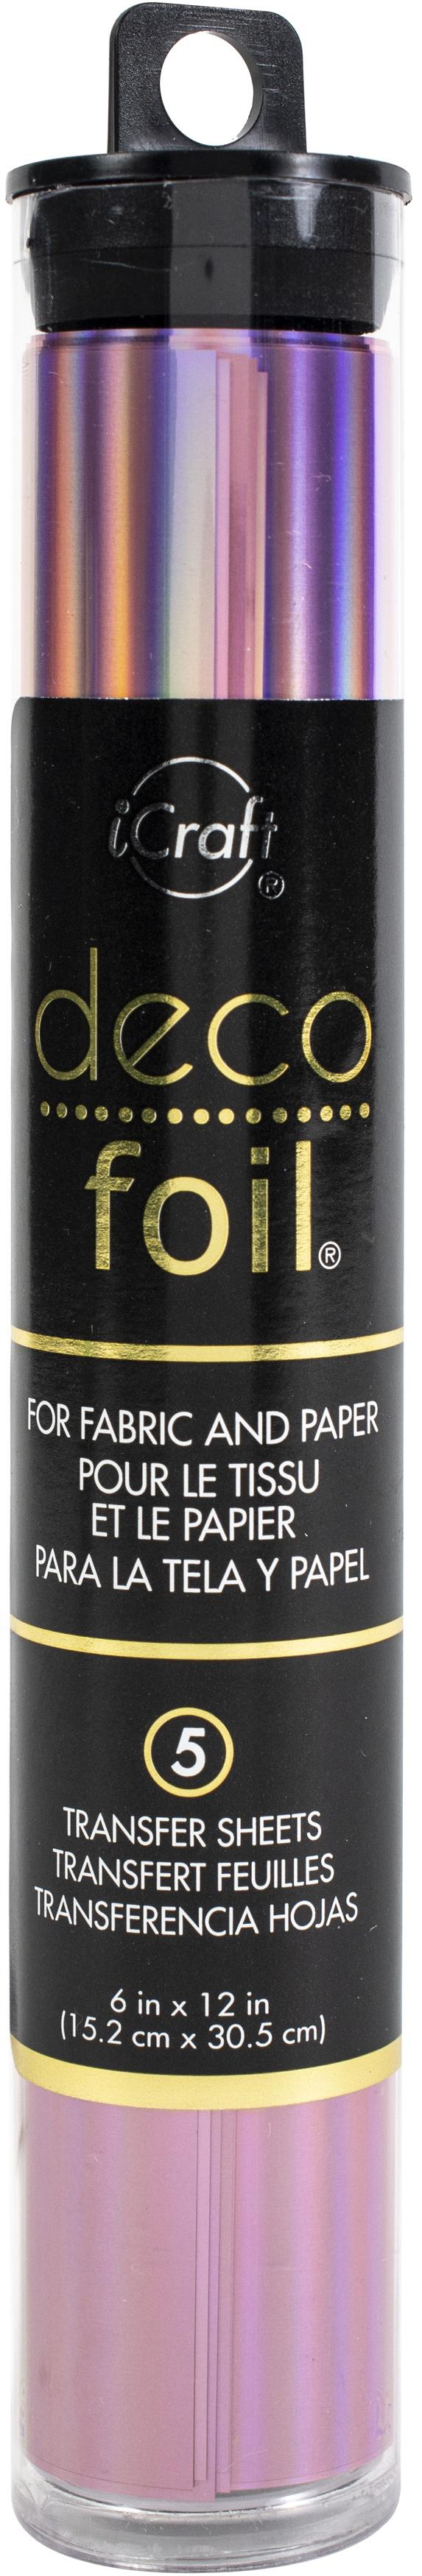 Deco Foil Specialty Transfer Sheets 6X12 5/Pkg-Enchanted Rose